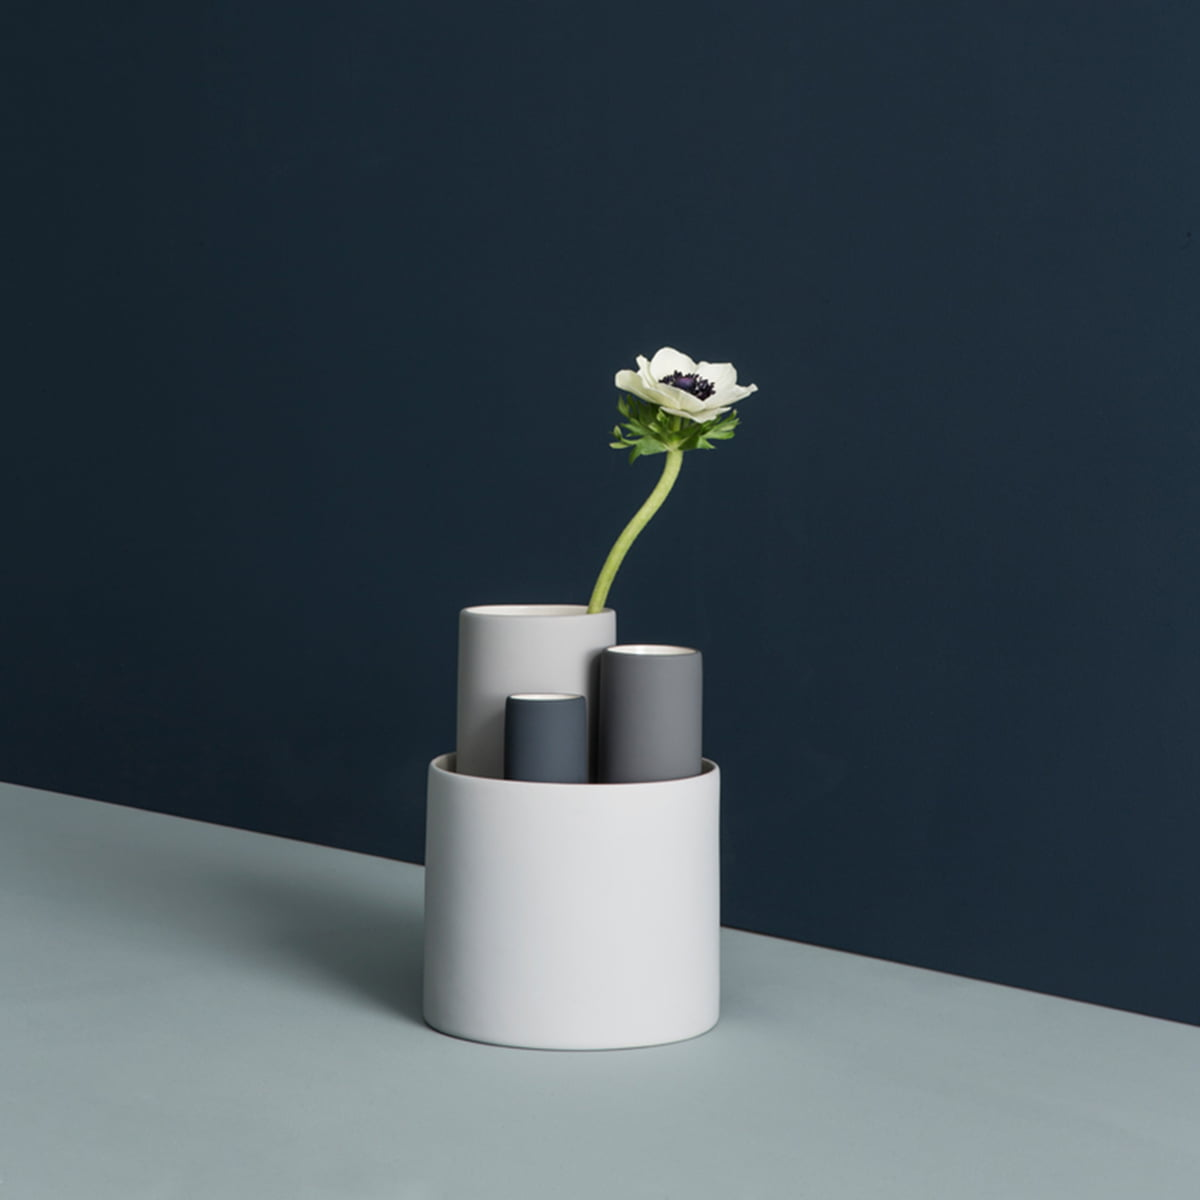 The ferm living collect vase set in our shop for Ferm living vase